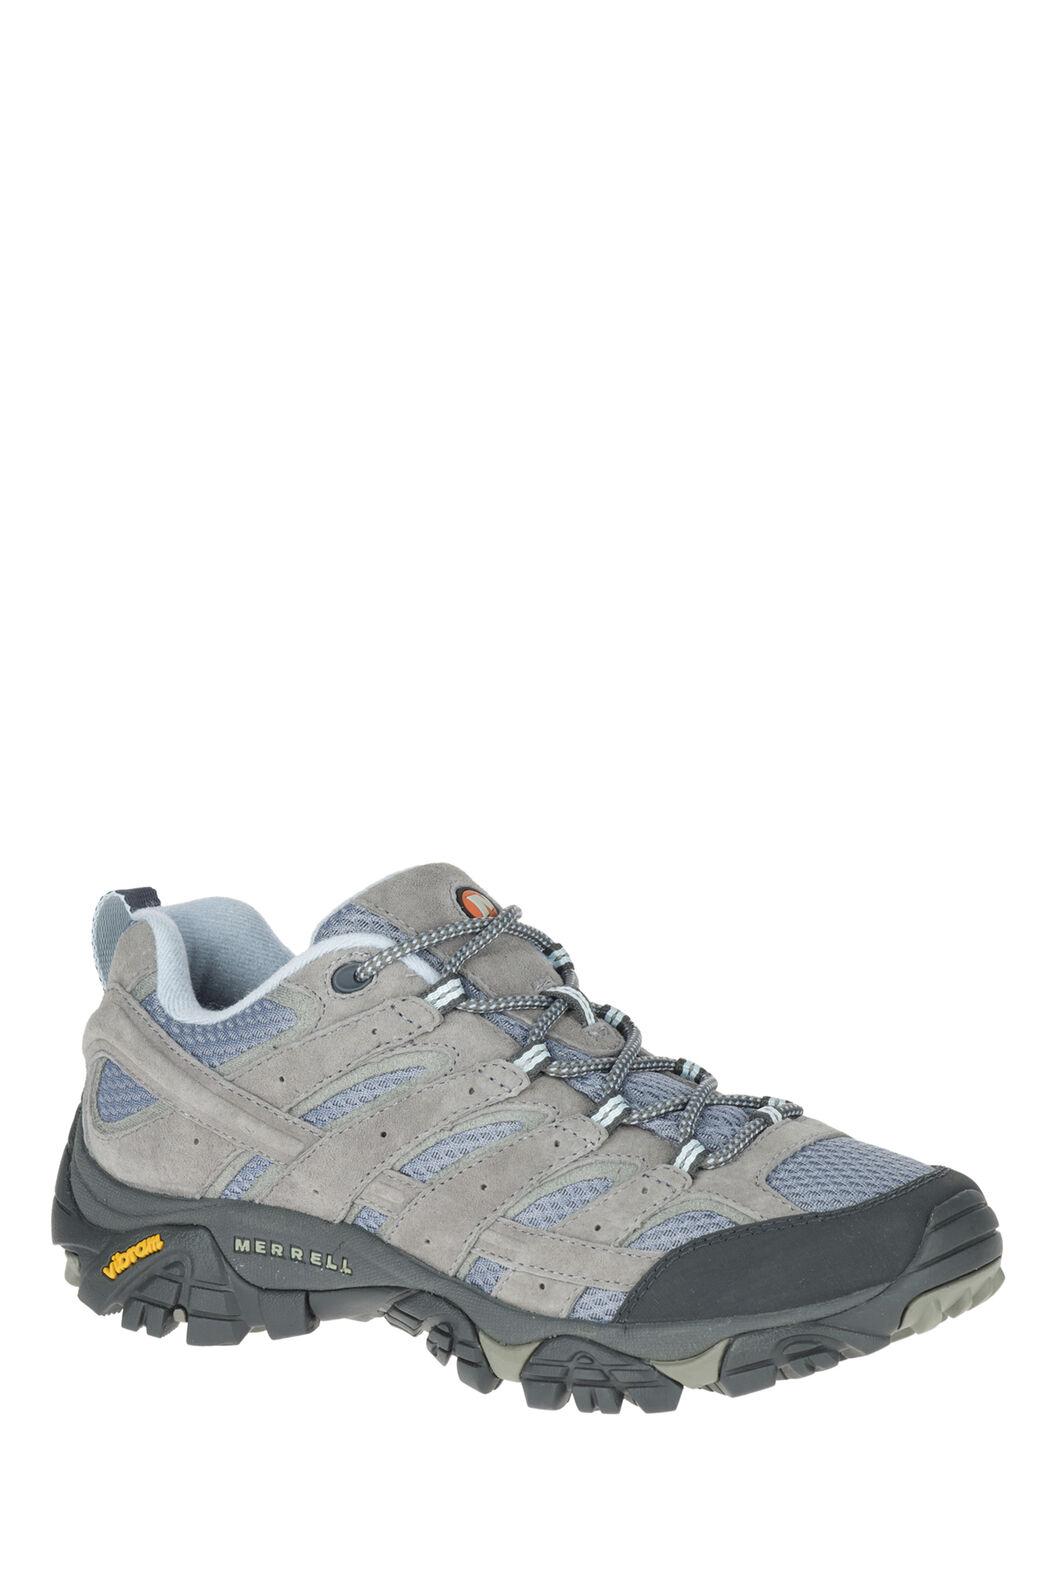 Merrell Moab 2 Ventilator Shoes — Women's, Smoke, hi-res